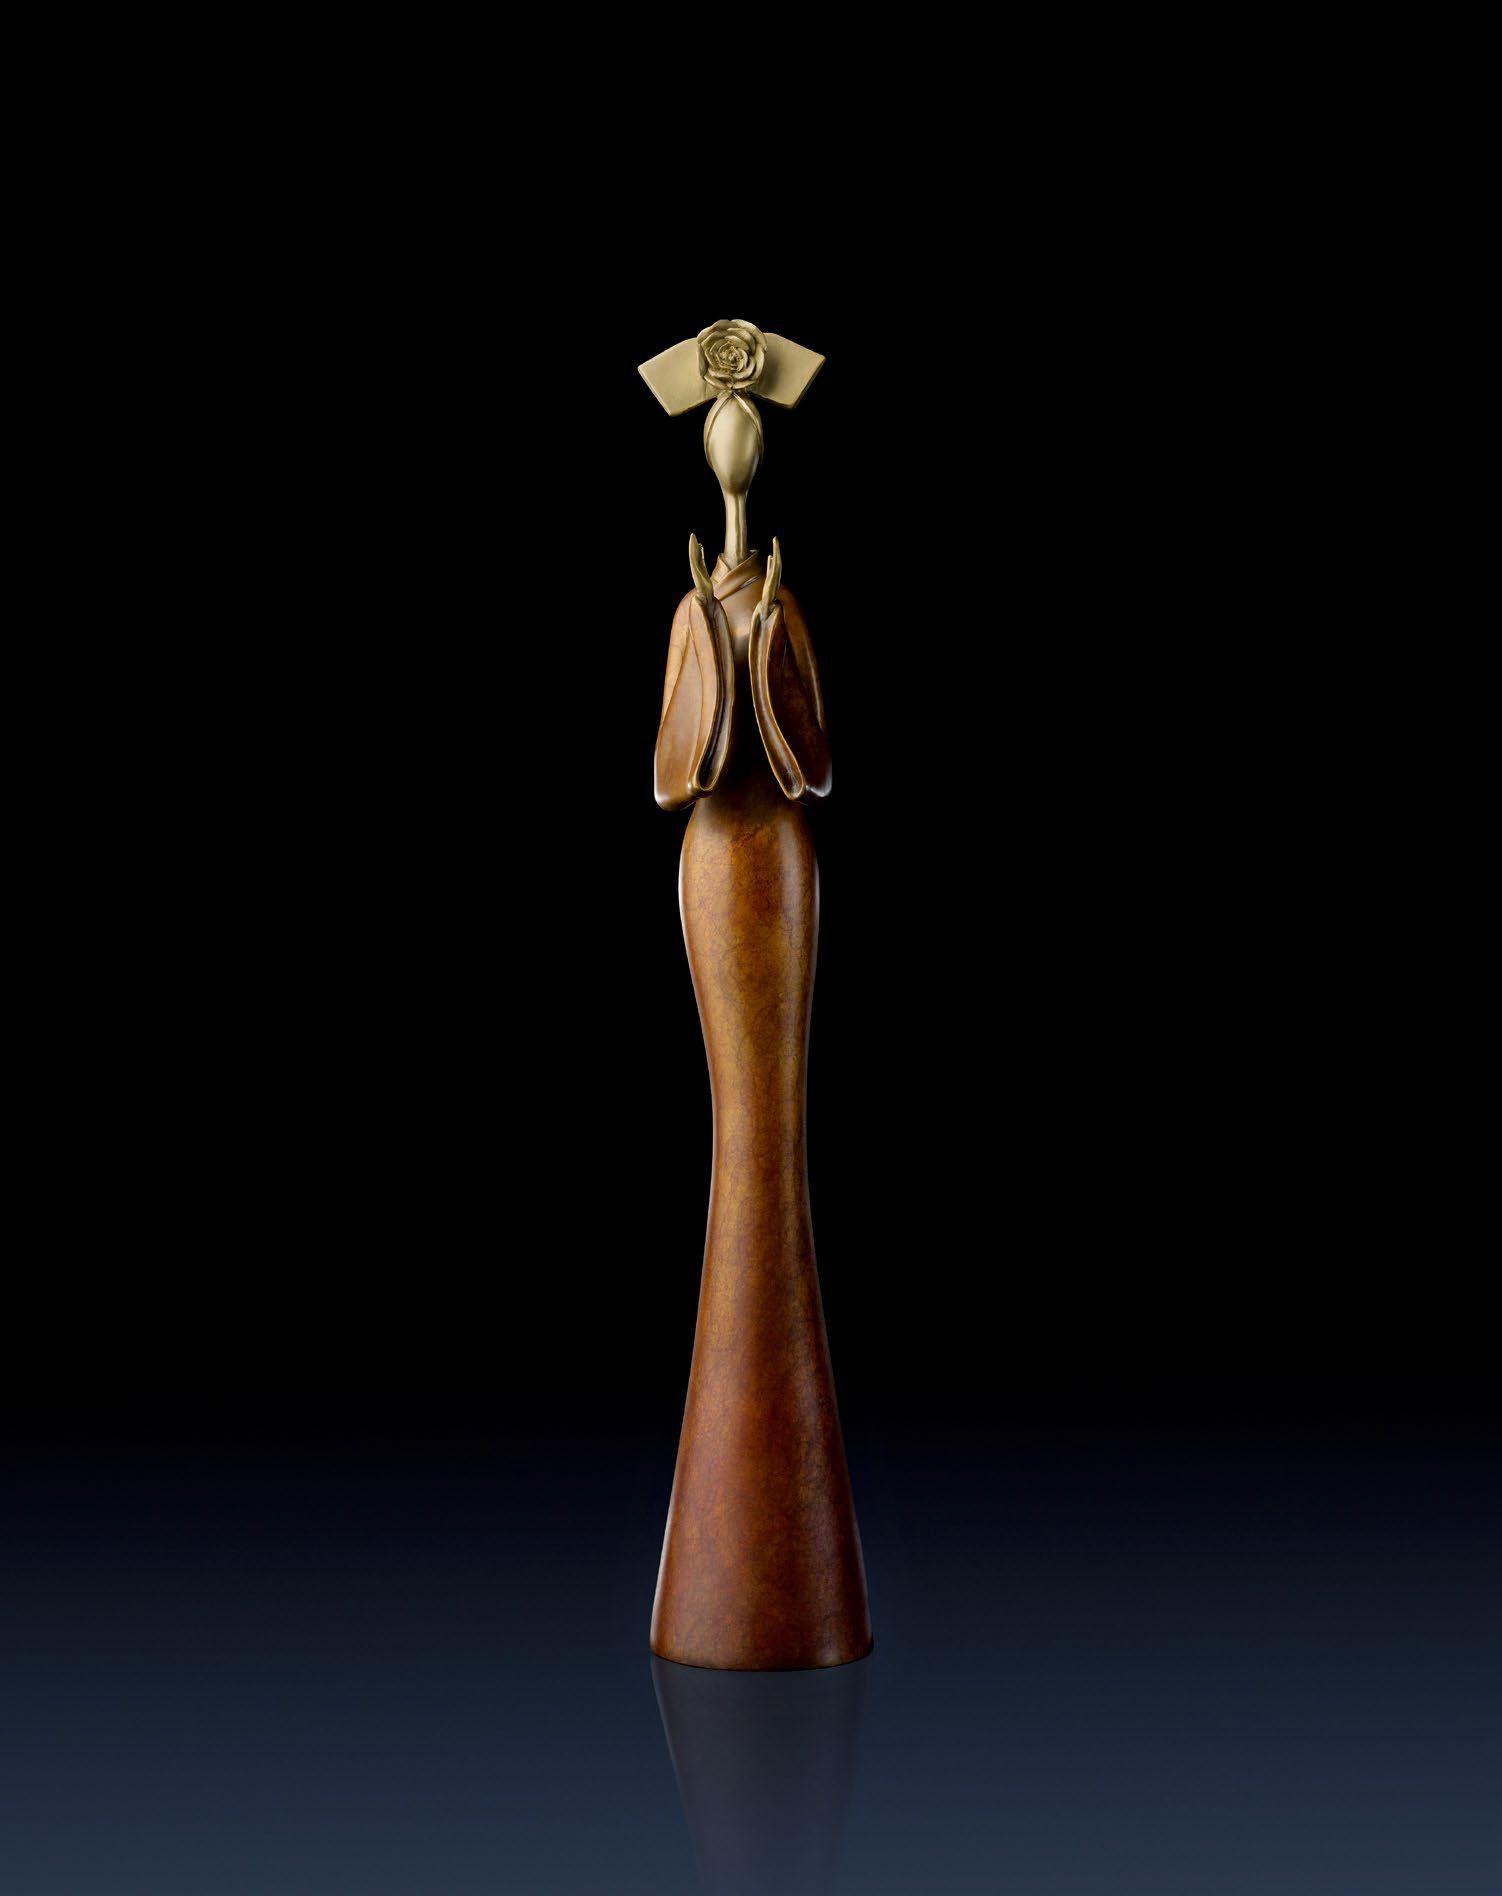 Brass Master Home decor sculpture - Metal crafts ornaments statue - Qing Dynasty Impression(III) 3010613 Special Price: $299.00 Links: http://www.amazon.com/gp/product/B00KK3IKU4